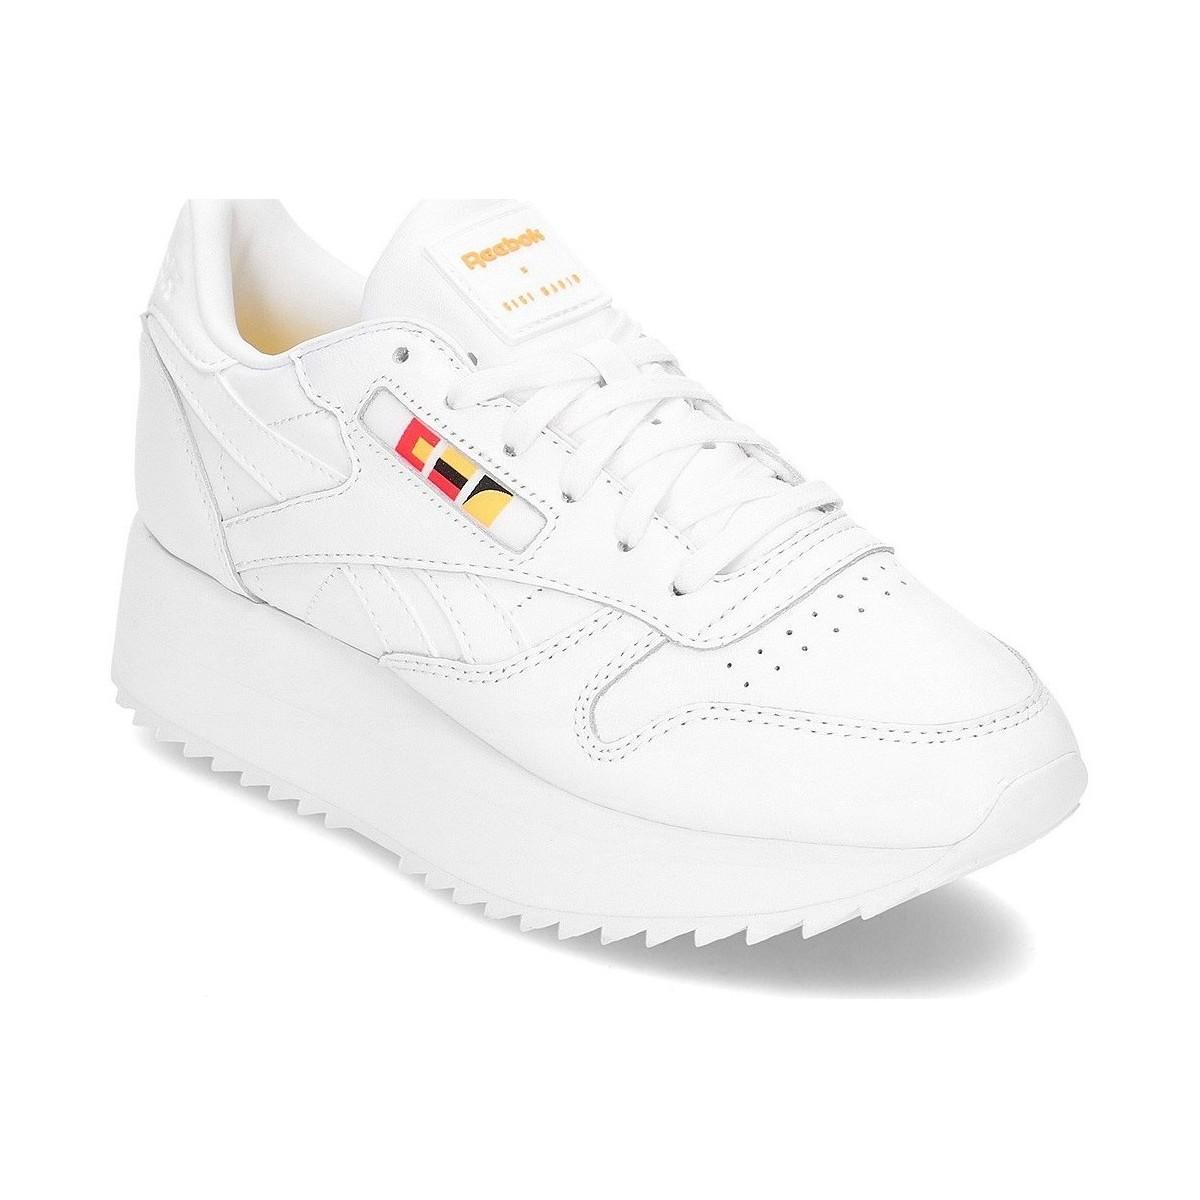 7fcd289db4c Reebok Classic Leather Double X Gigi Hadid Women s Shoes (trainers ...